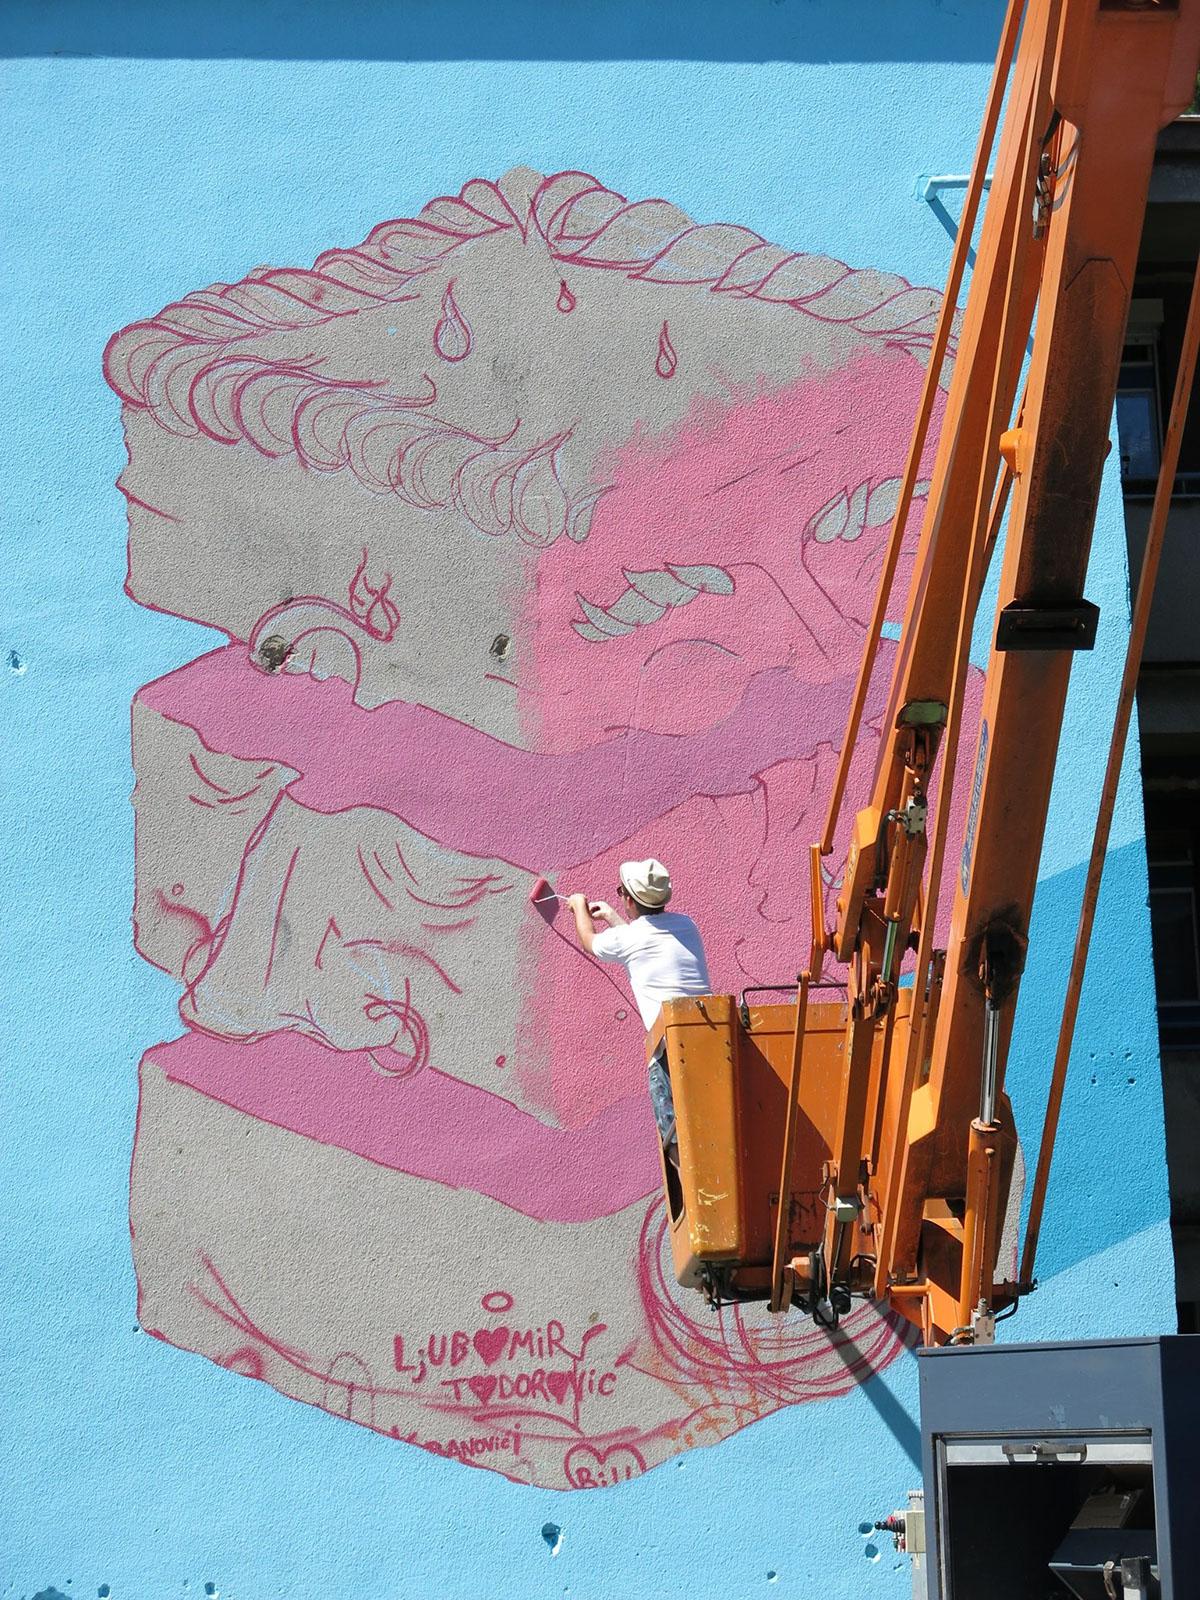 Mural Street art pink blue public building cartoon cake life